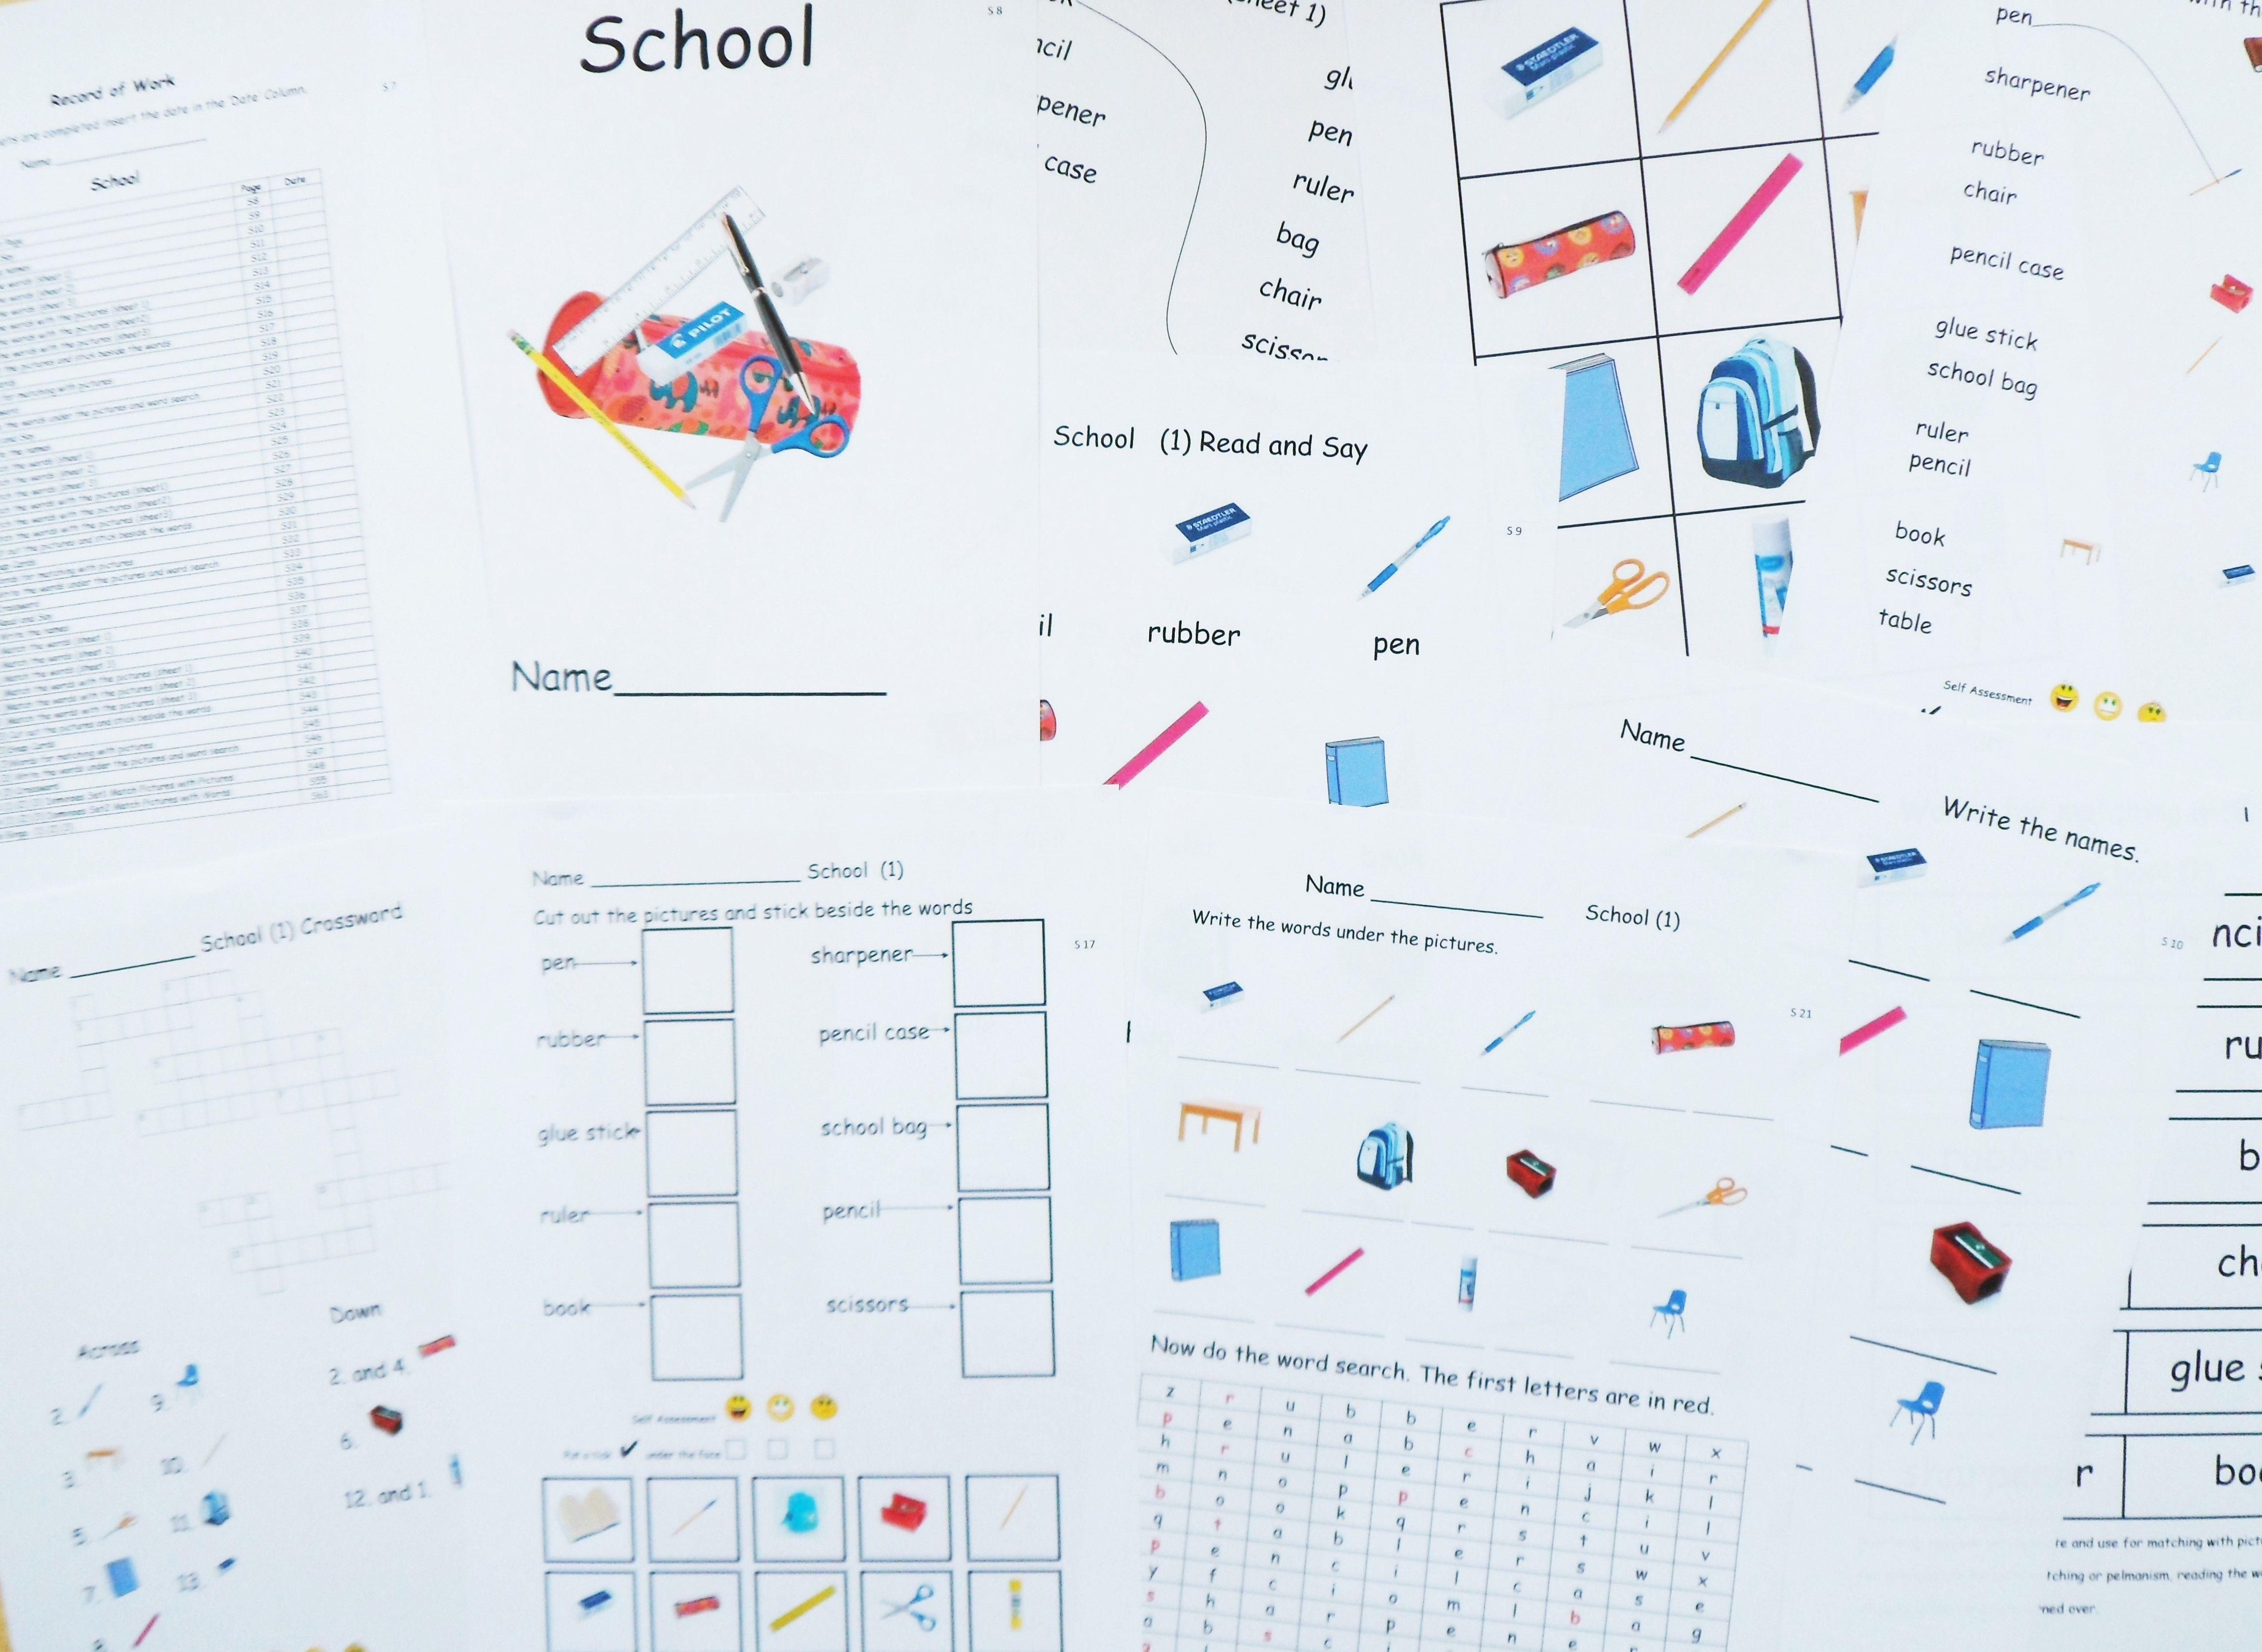 Esl Eal Ell Efl Vocabulary Worksheets And Games For